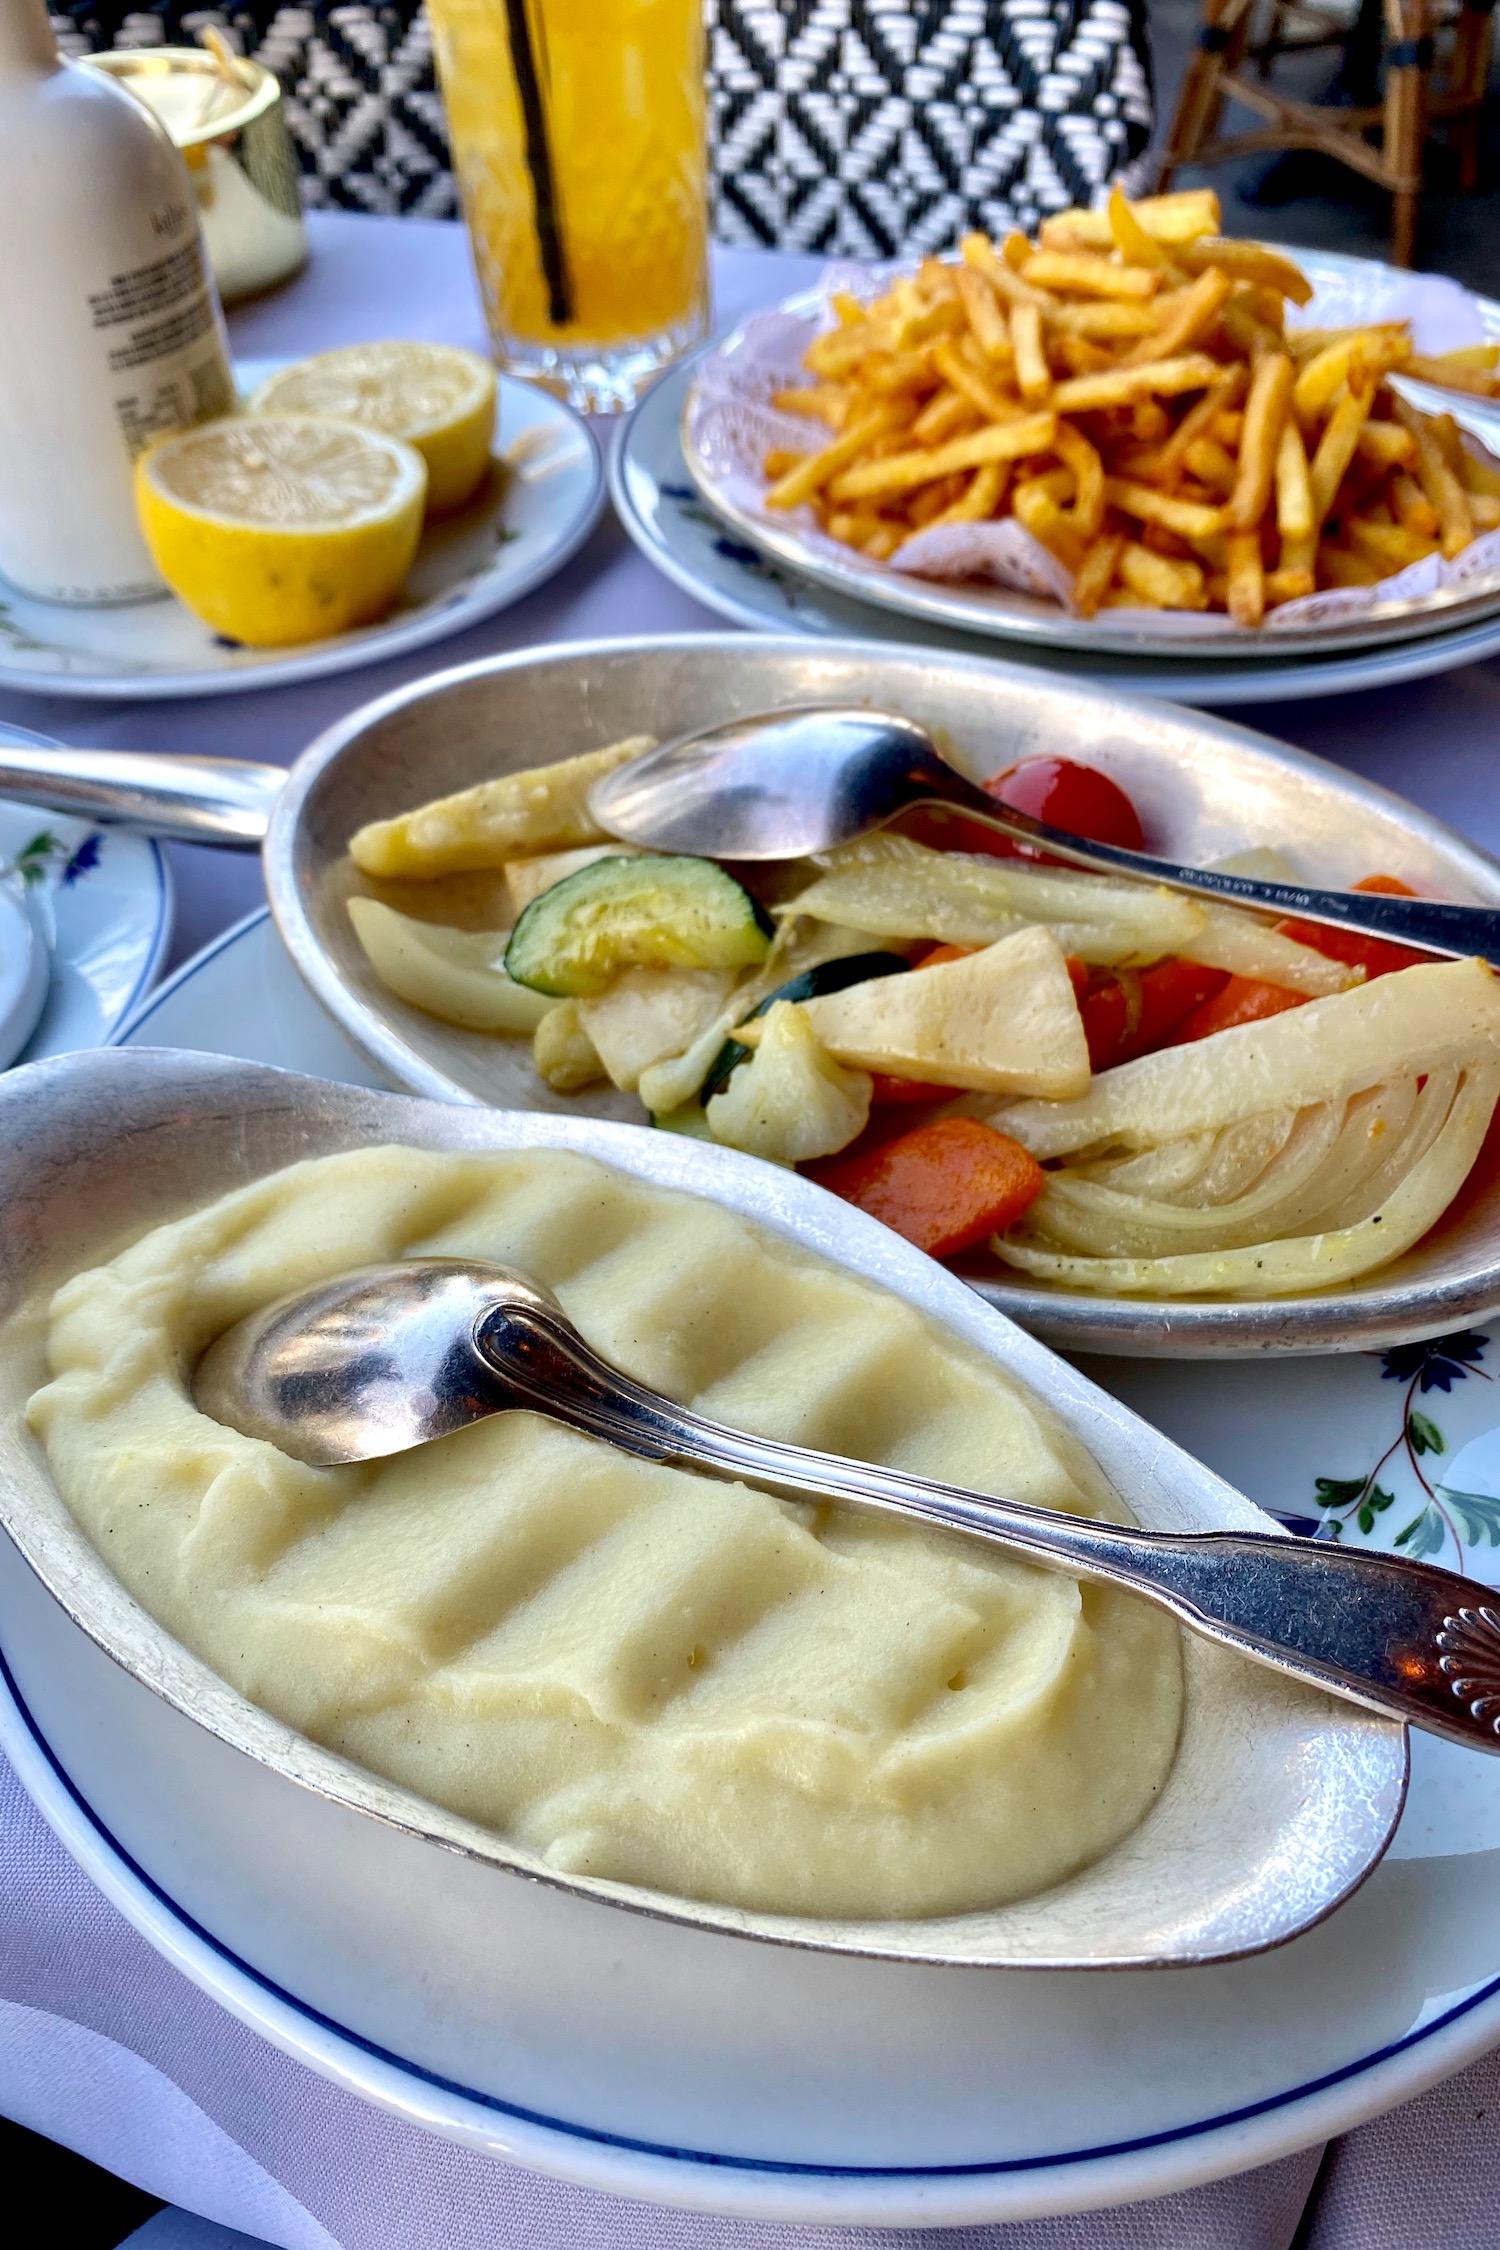 Le Voltaire frites and pomme purée